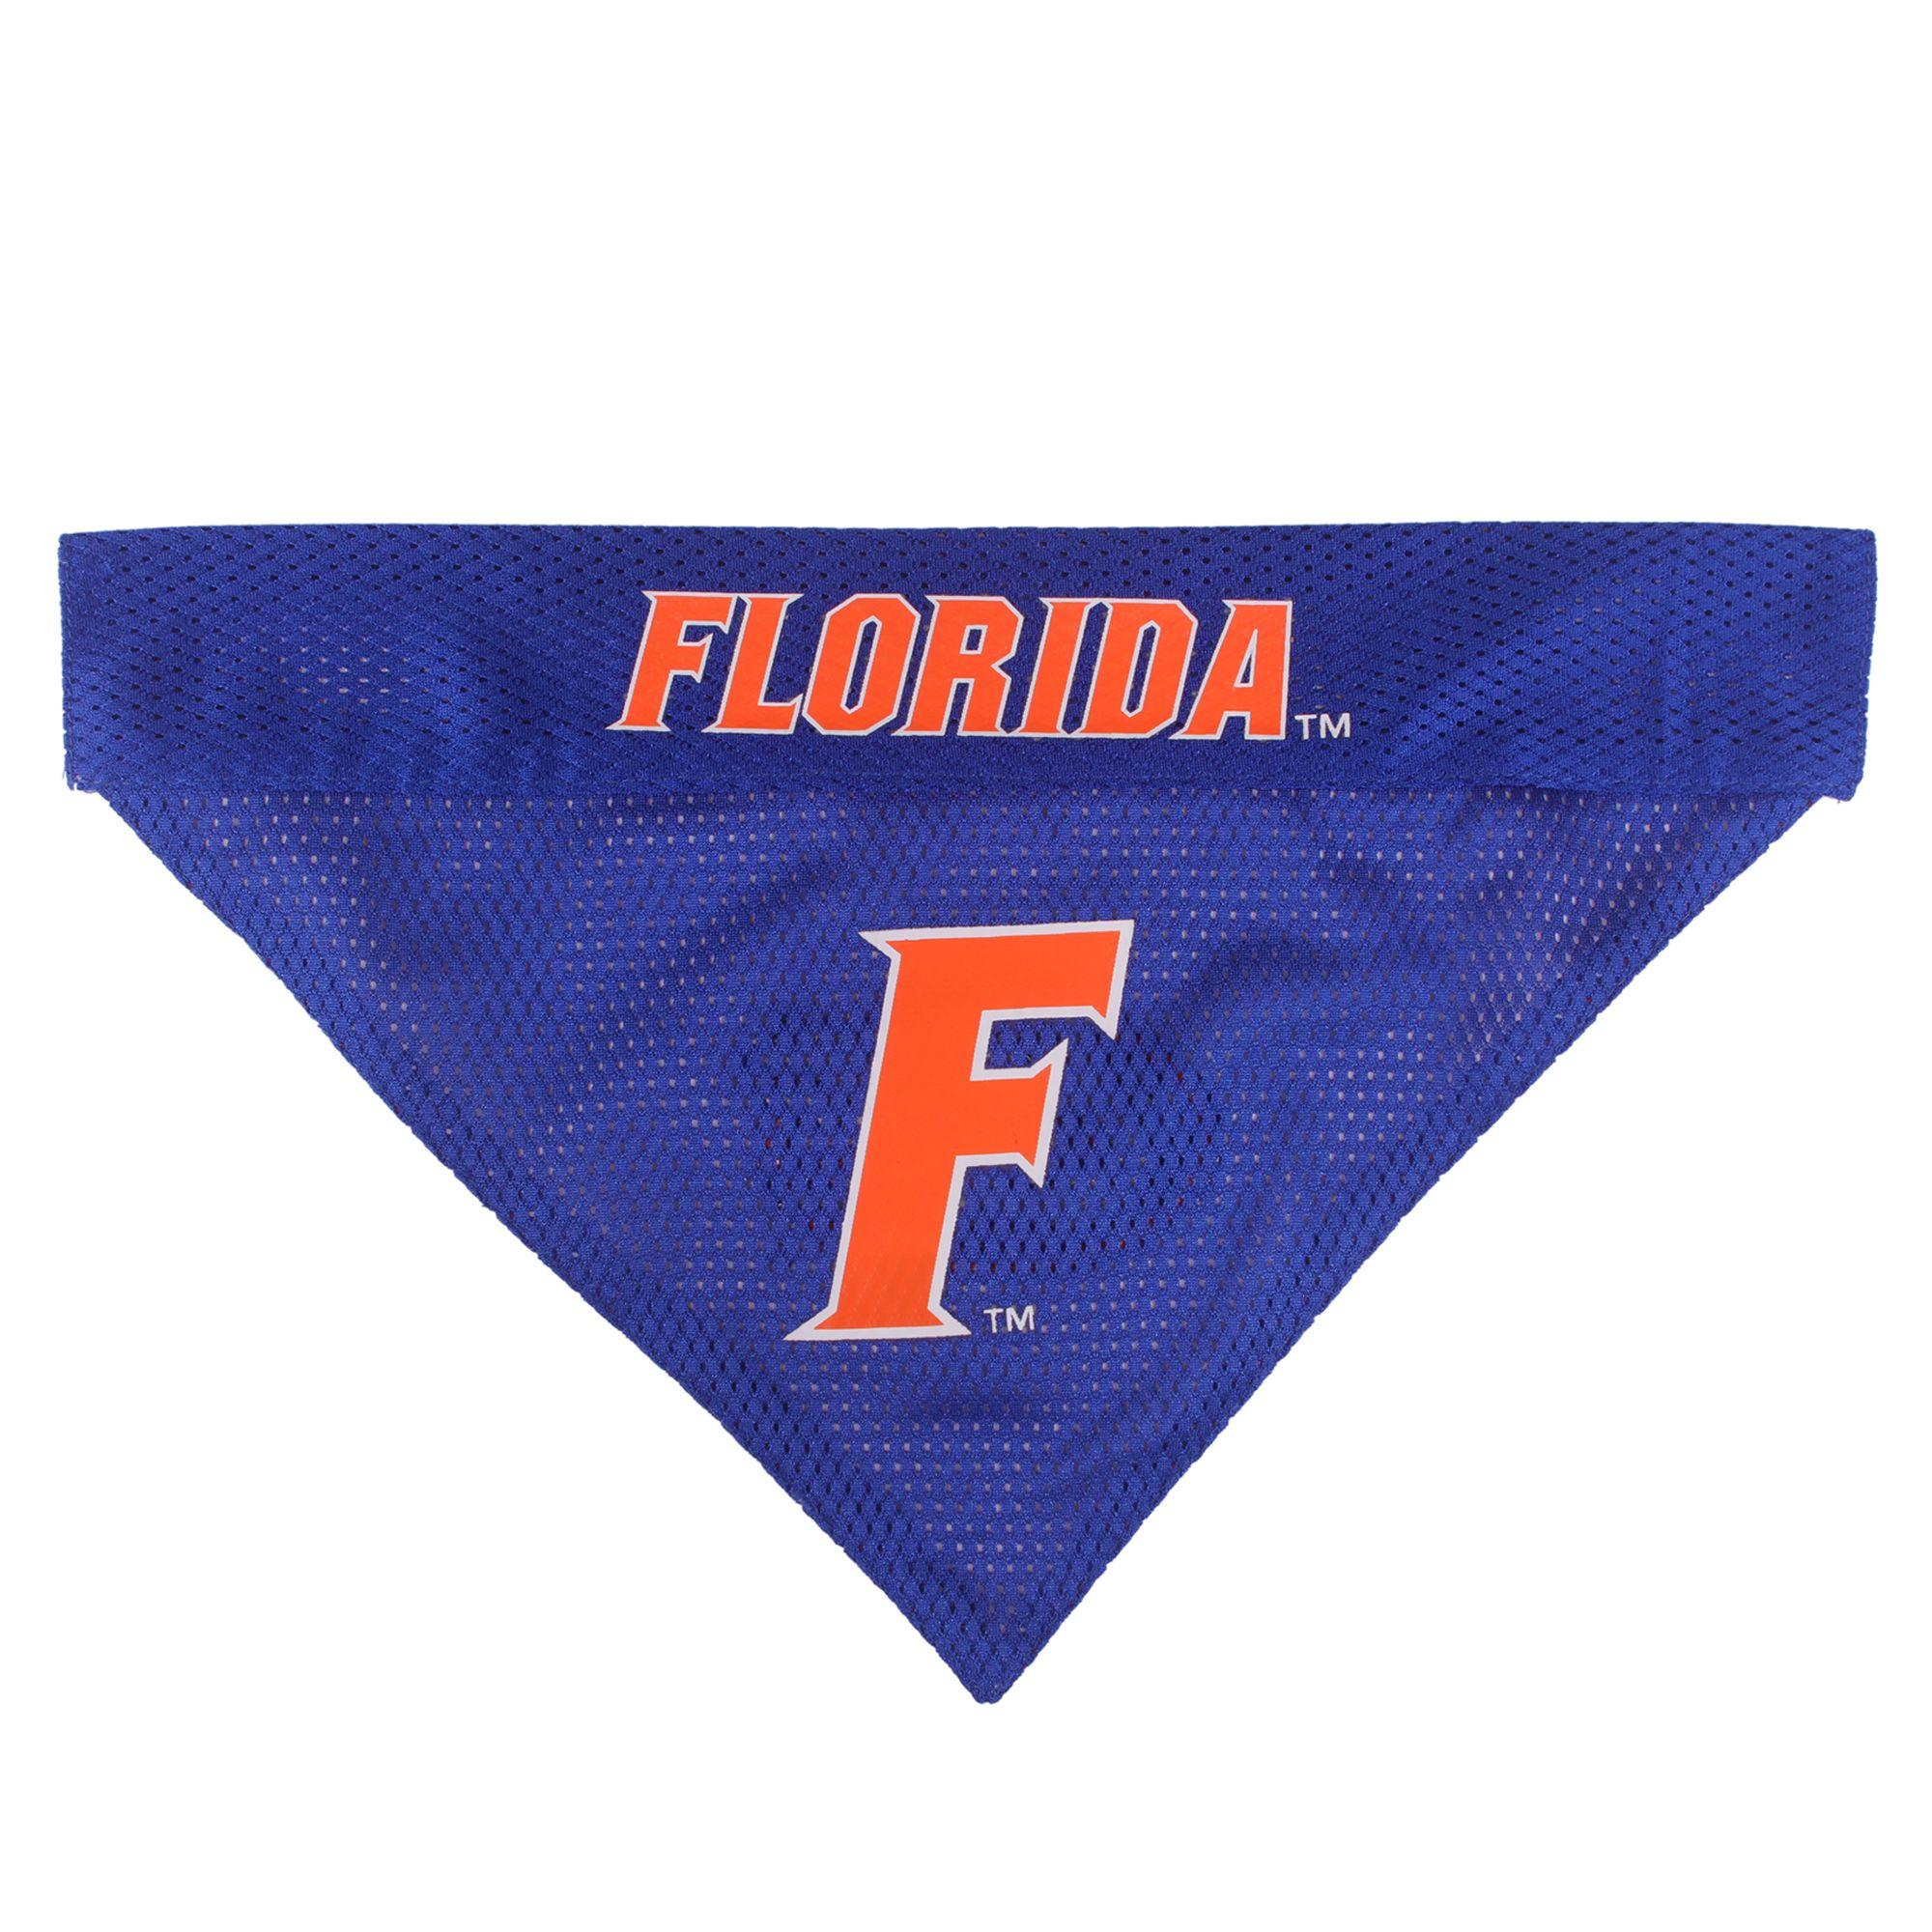 All Star Dogs Florida Gators Dog Bandana